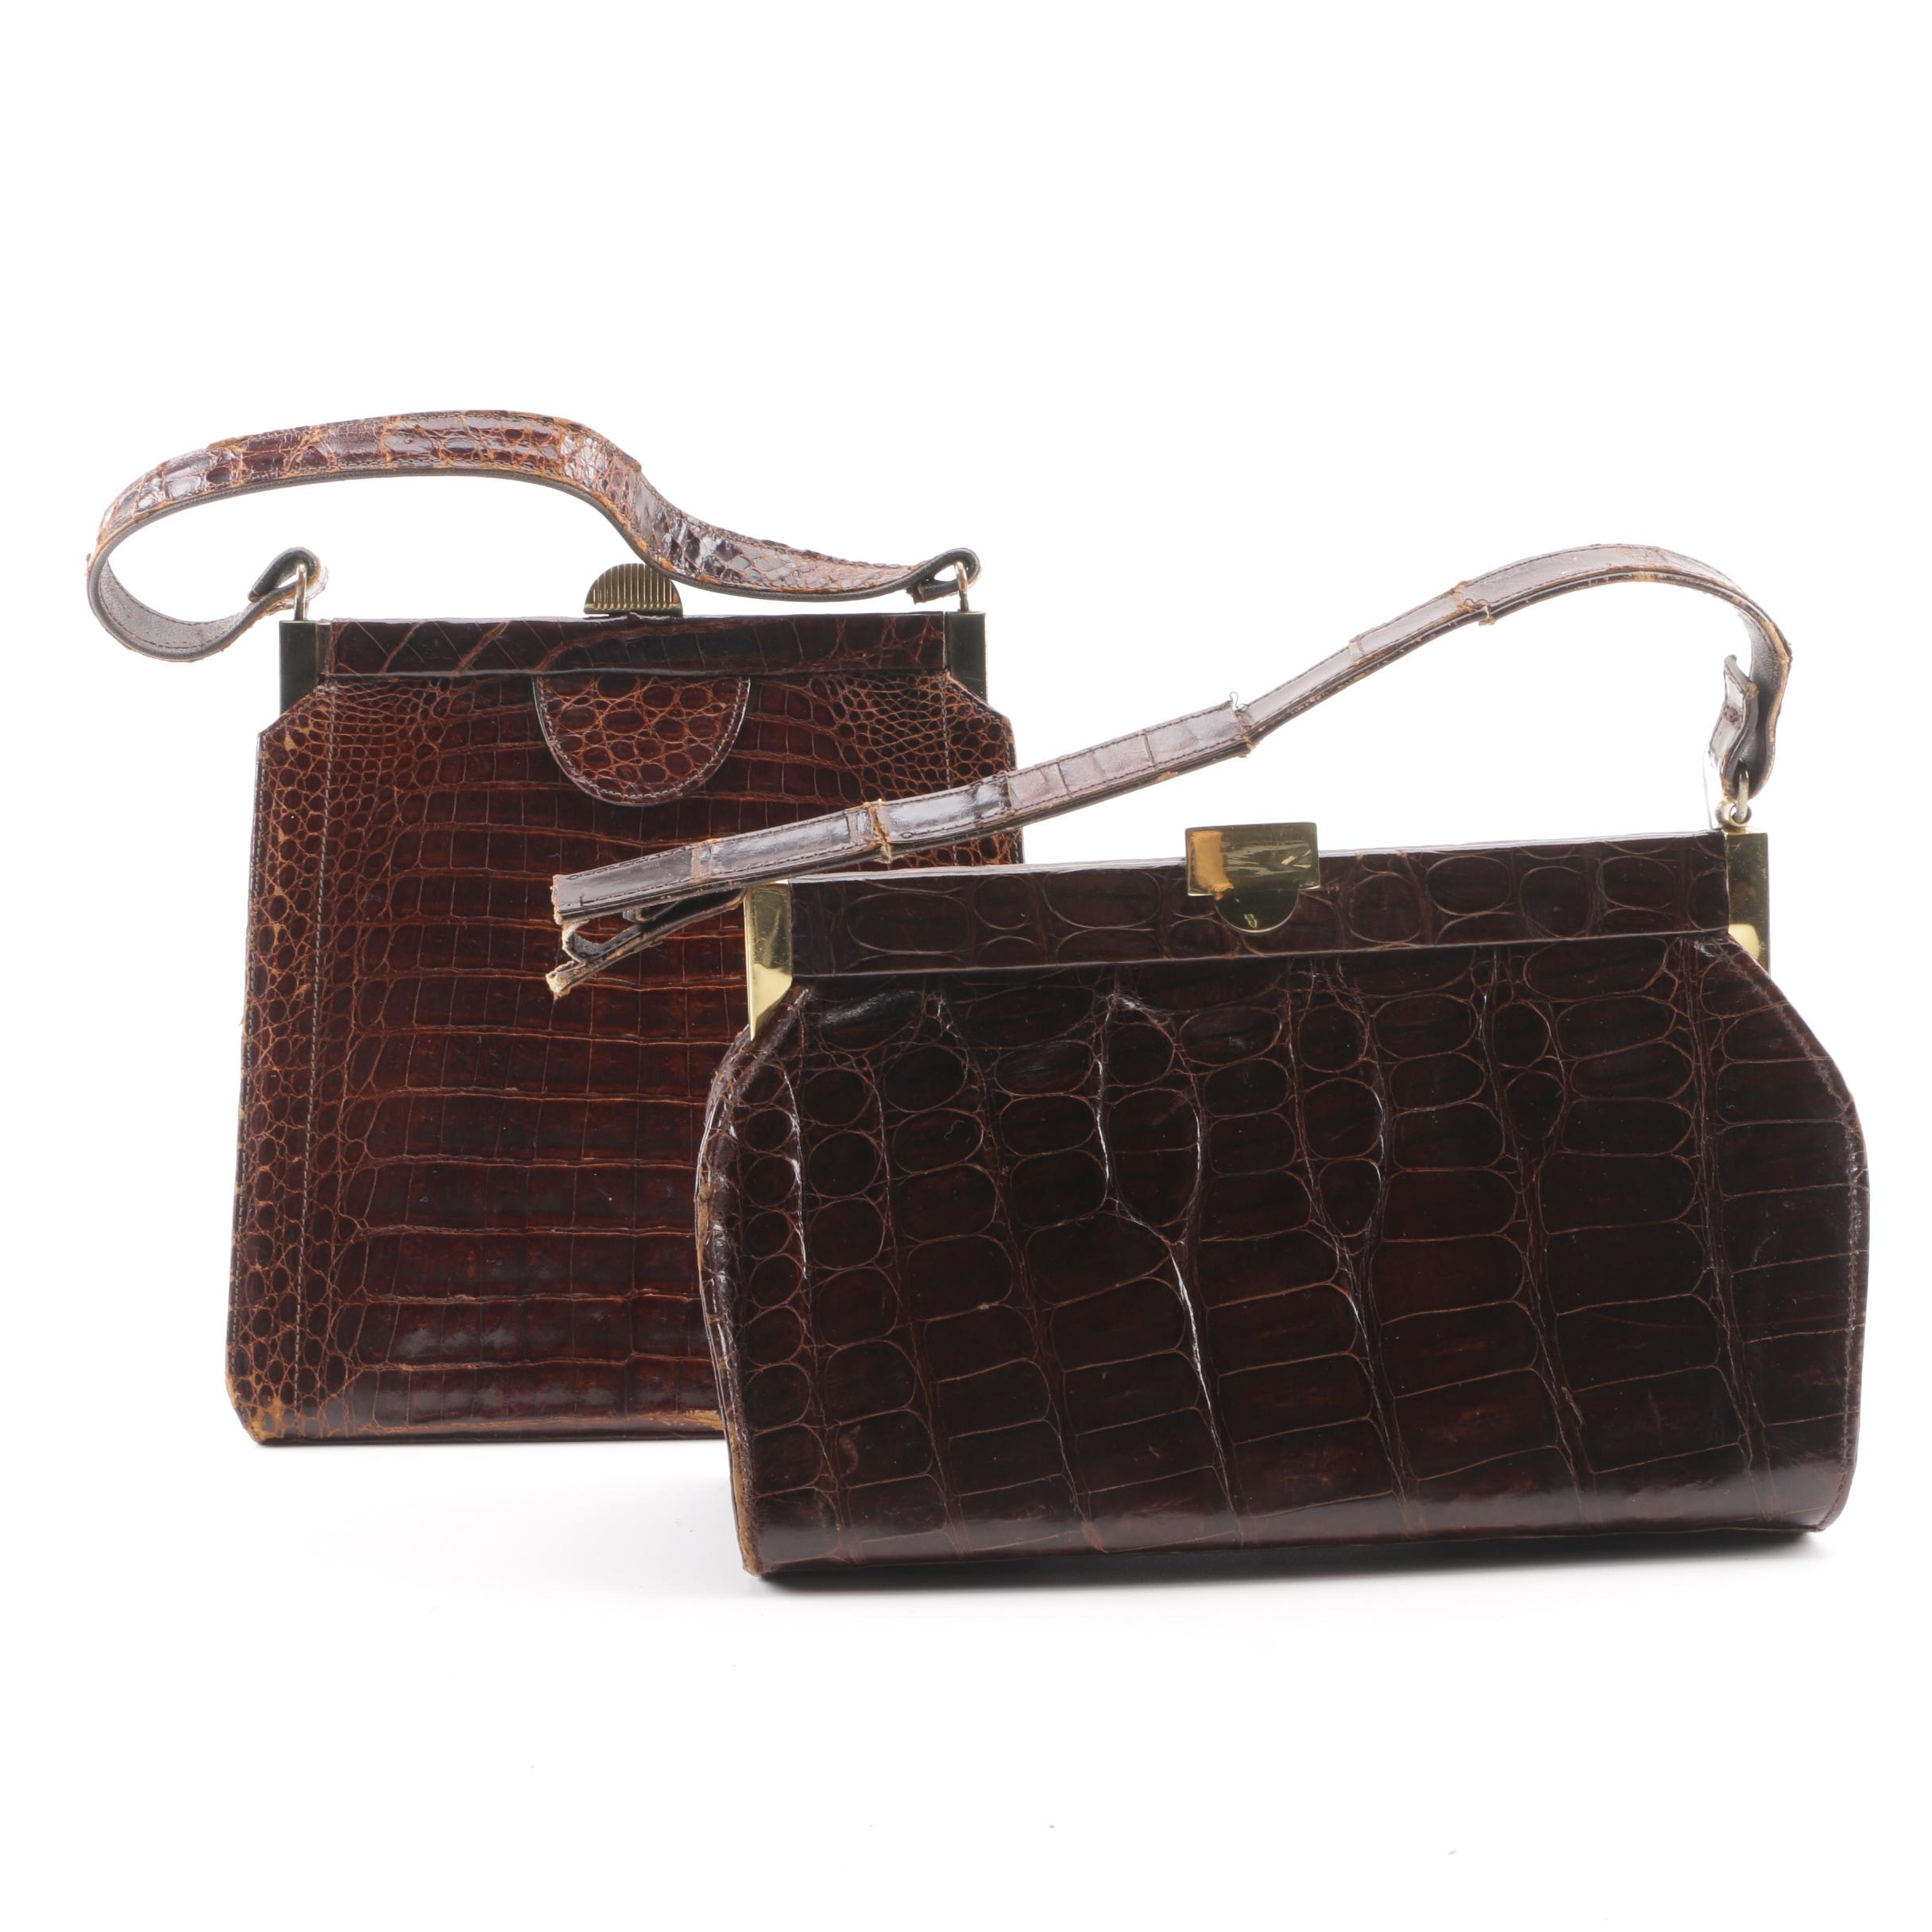 Vintage Brown Crocodile and Alligator Handbags